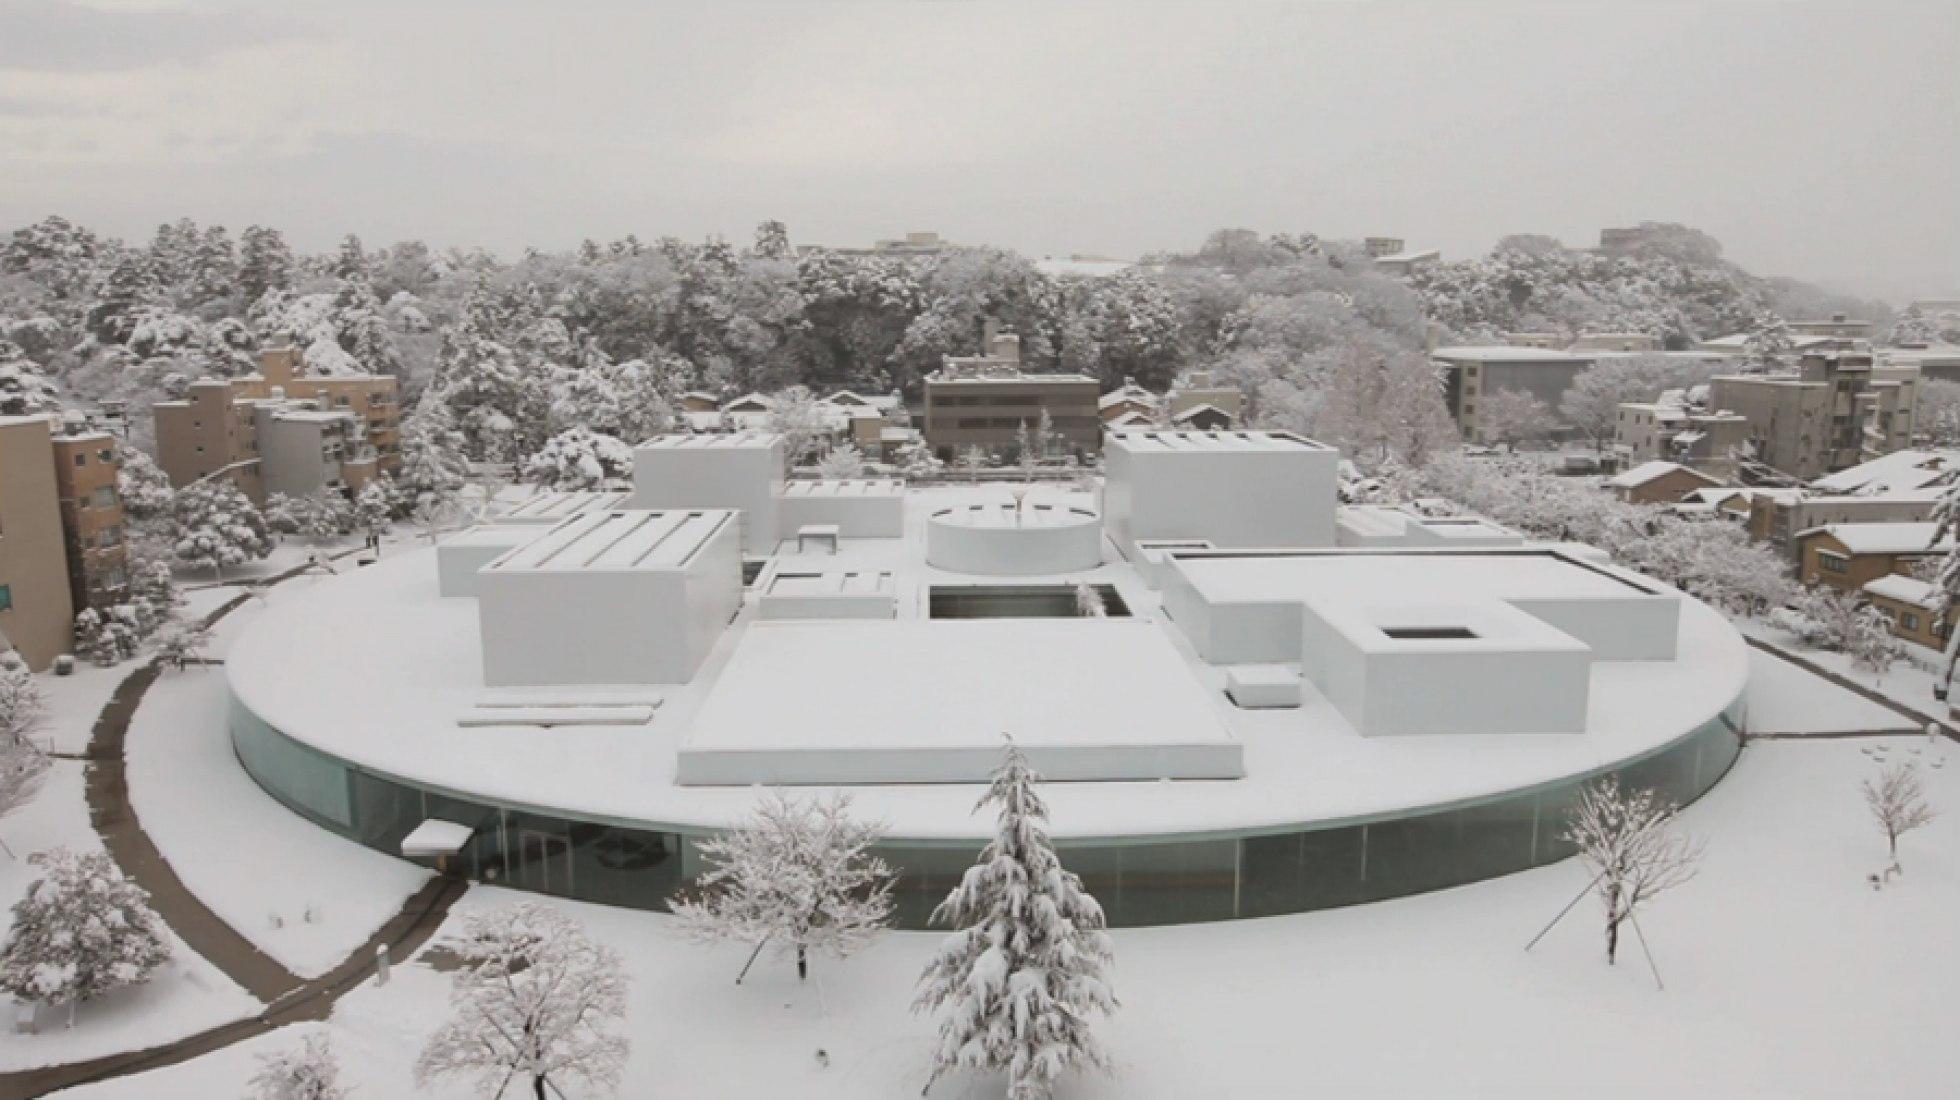 Museum exterior view. Video screenshot.